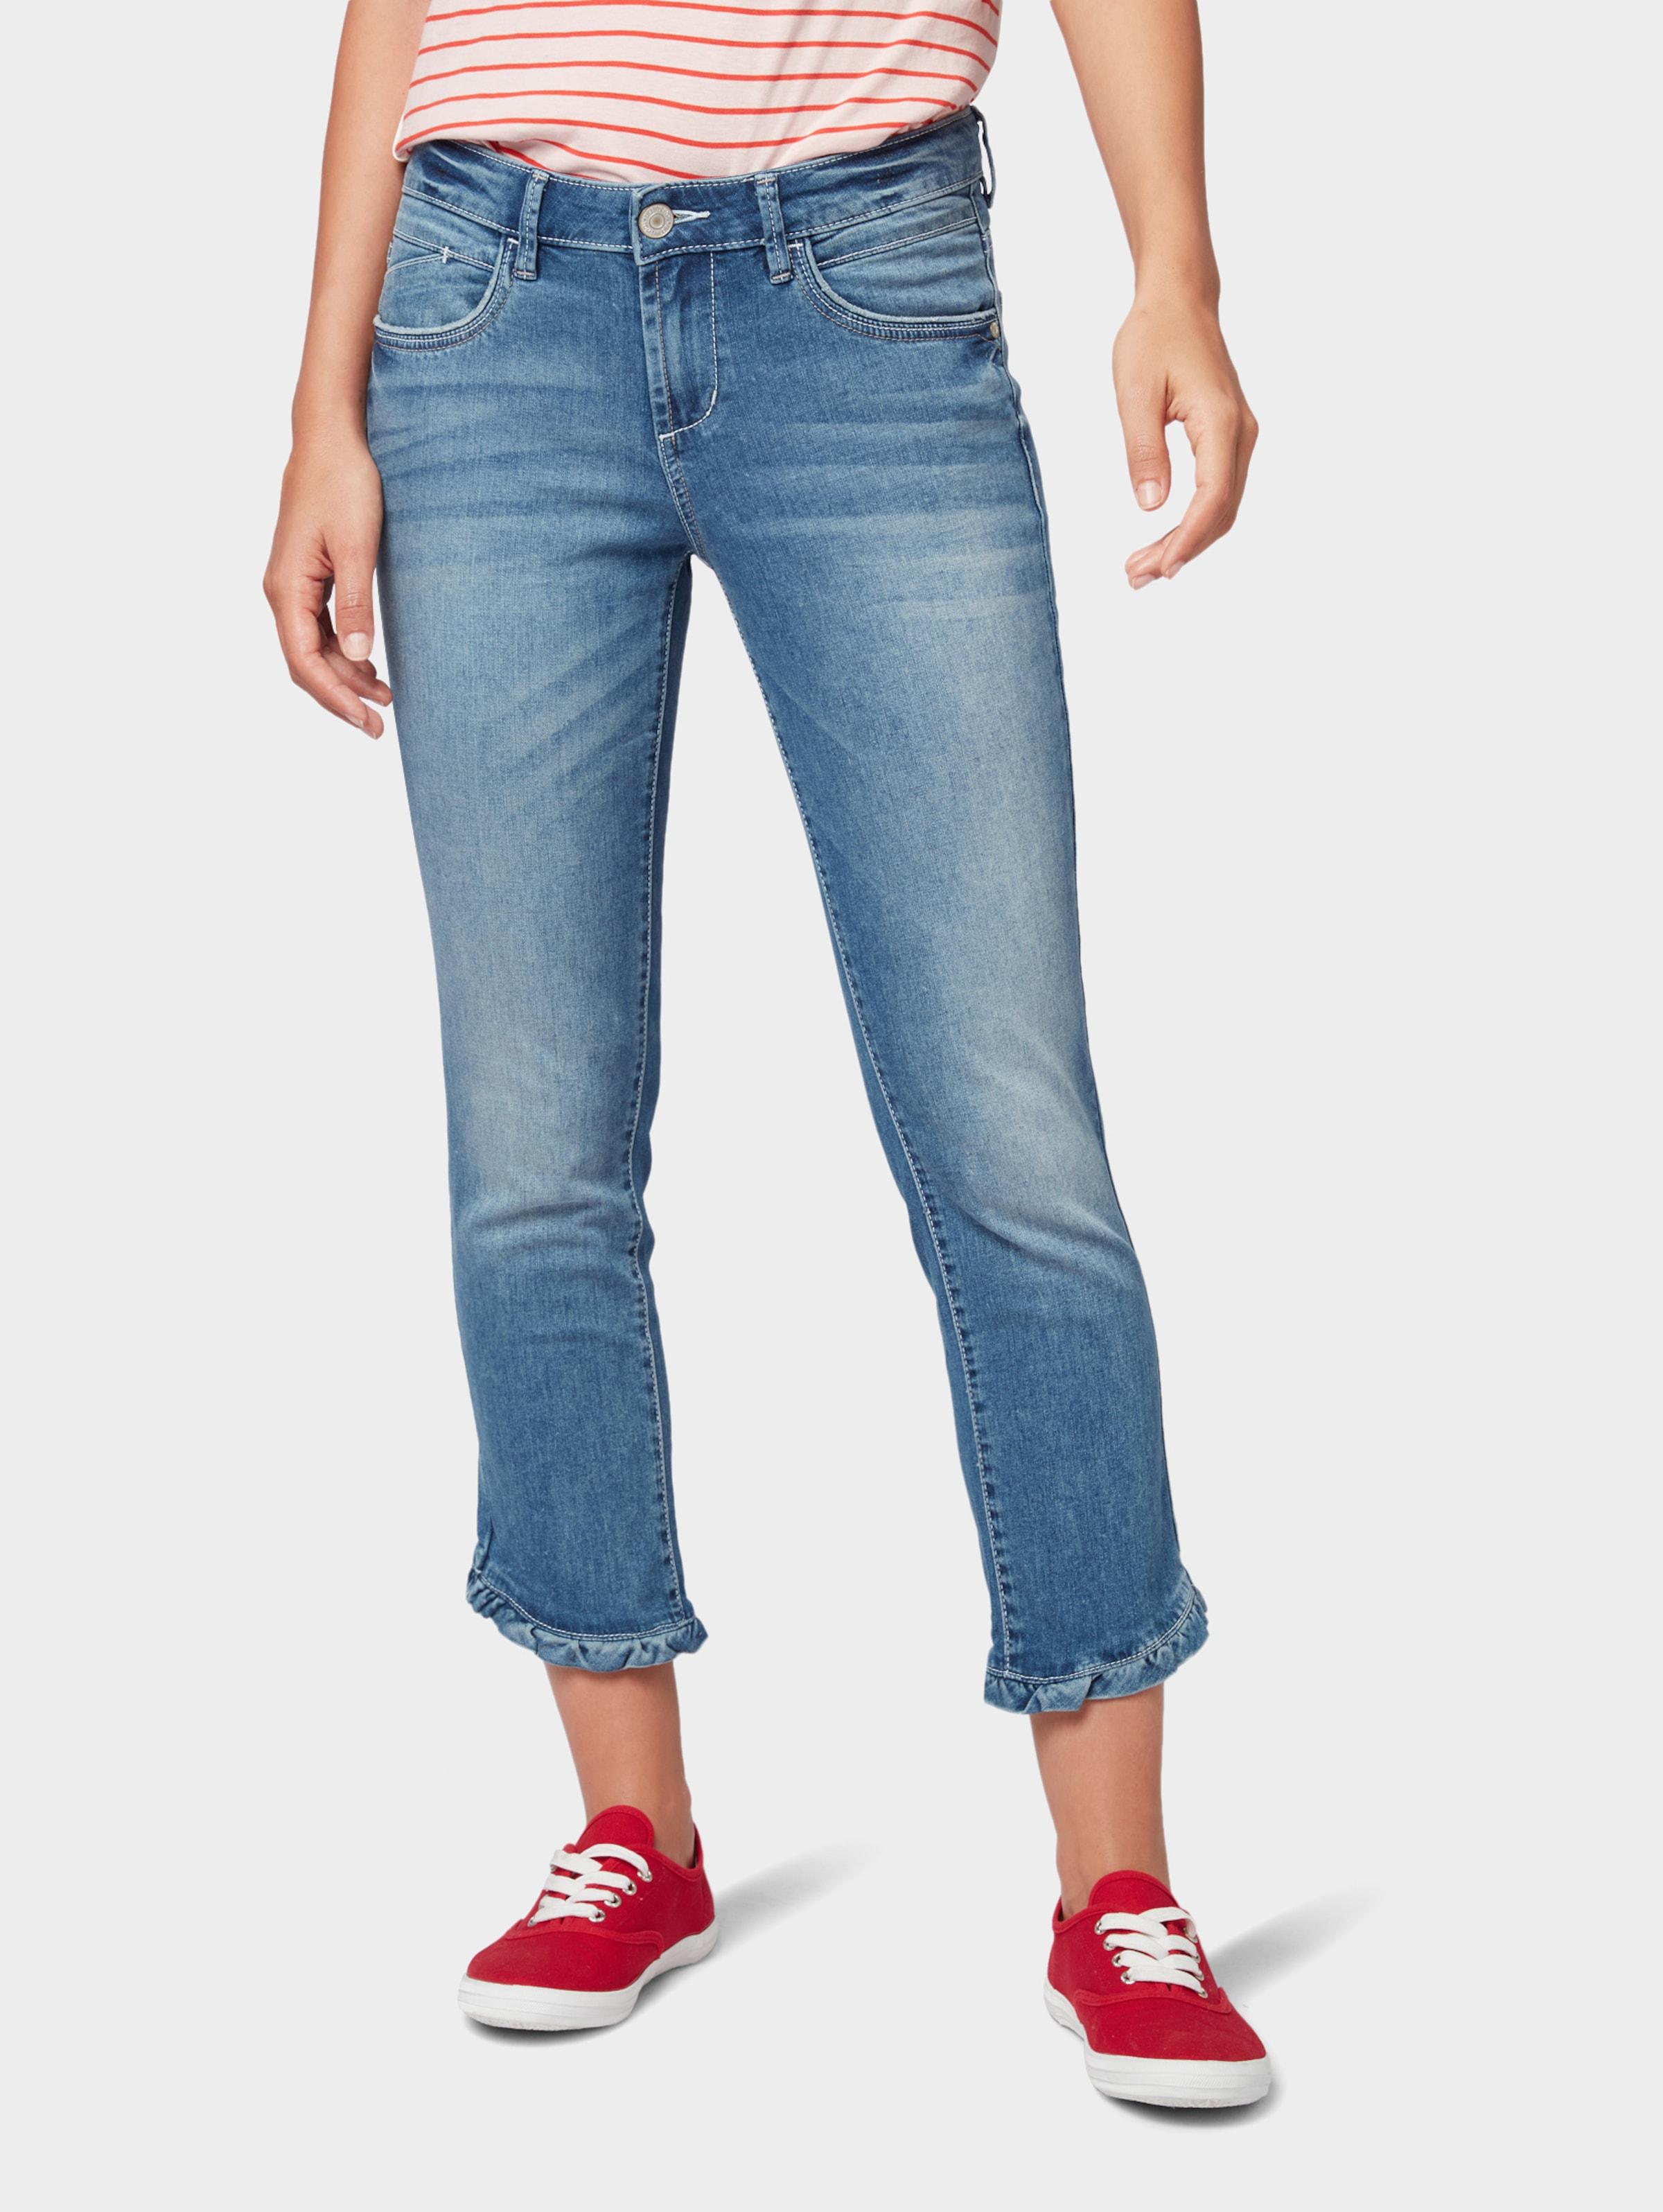 Blue In Tom Denim 'alexa' Tailor Jeans 5Aq4LR3j